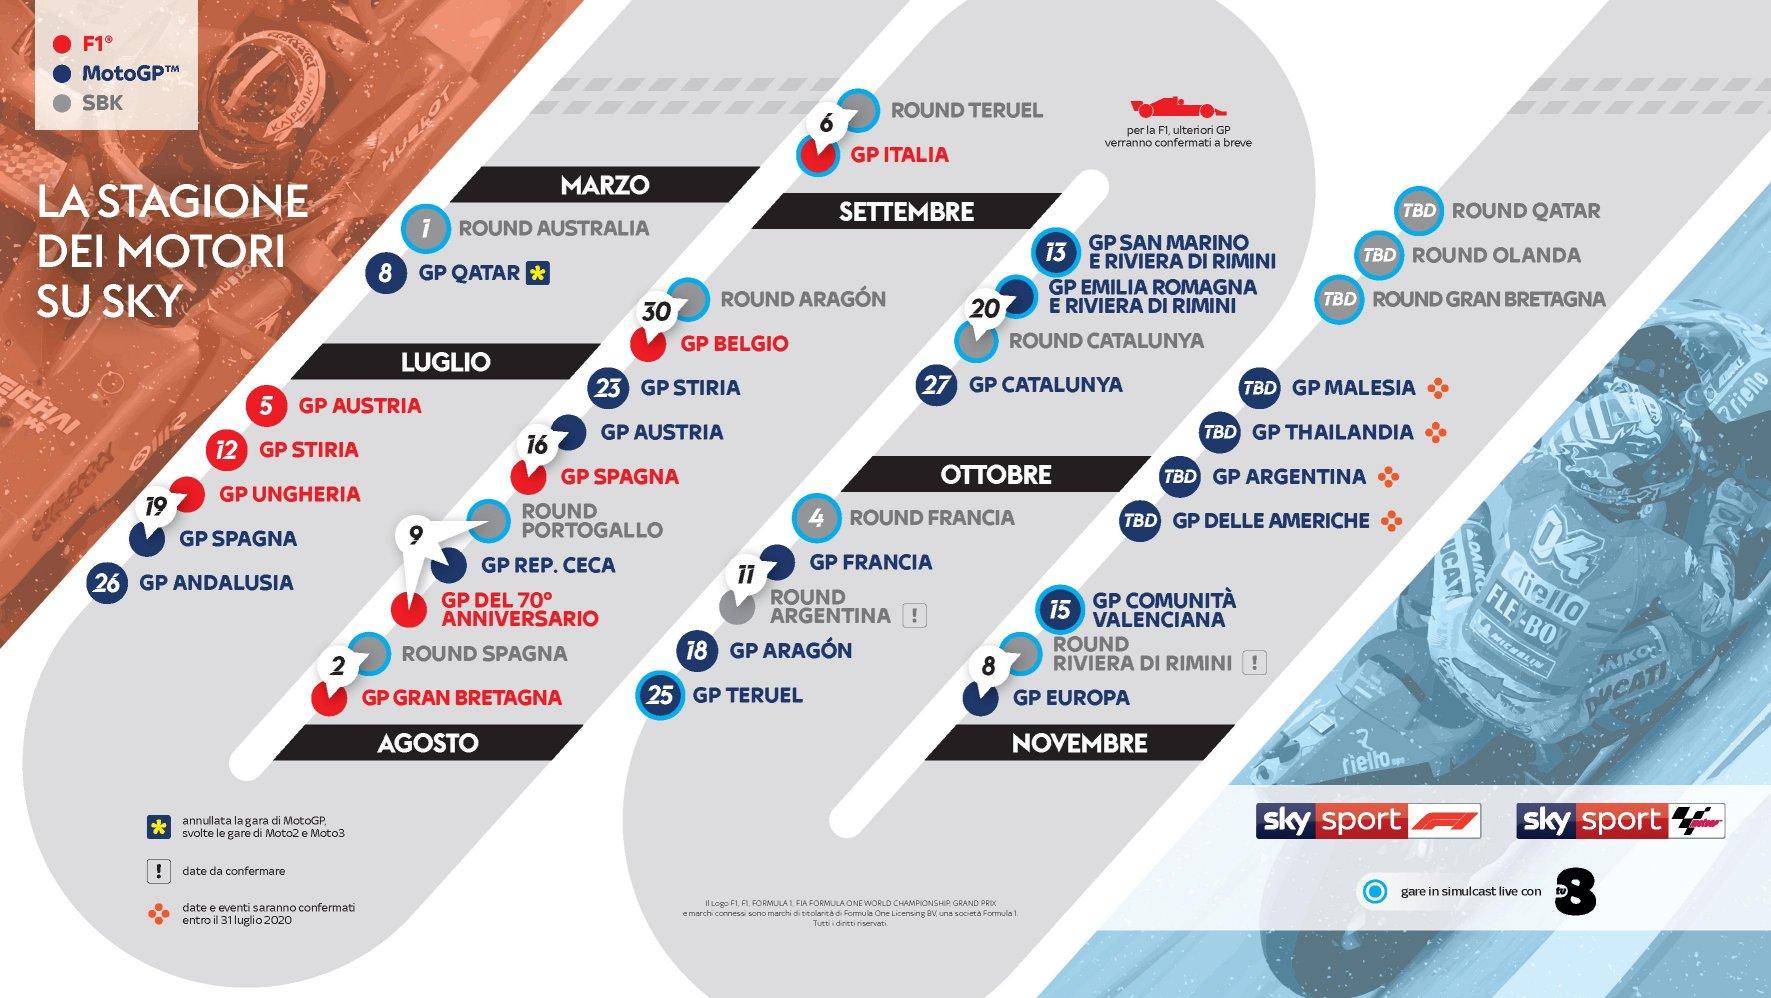 Sky Sport, Stagione Motori 2020 MotoGP, SuperBike, F1 (rinnovata fino al 2022)!